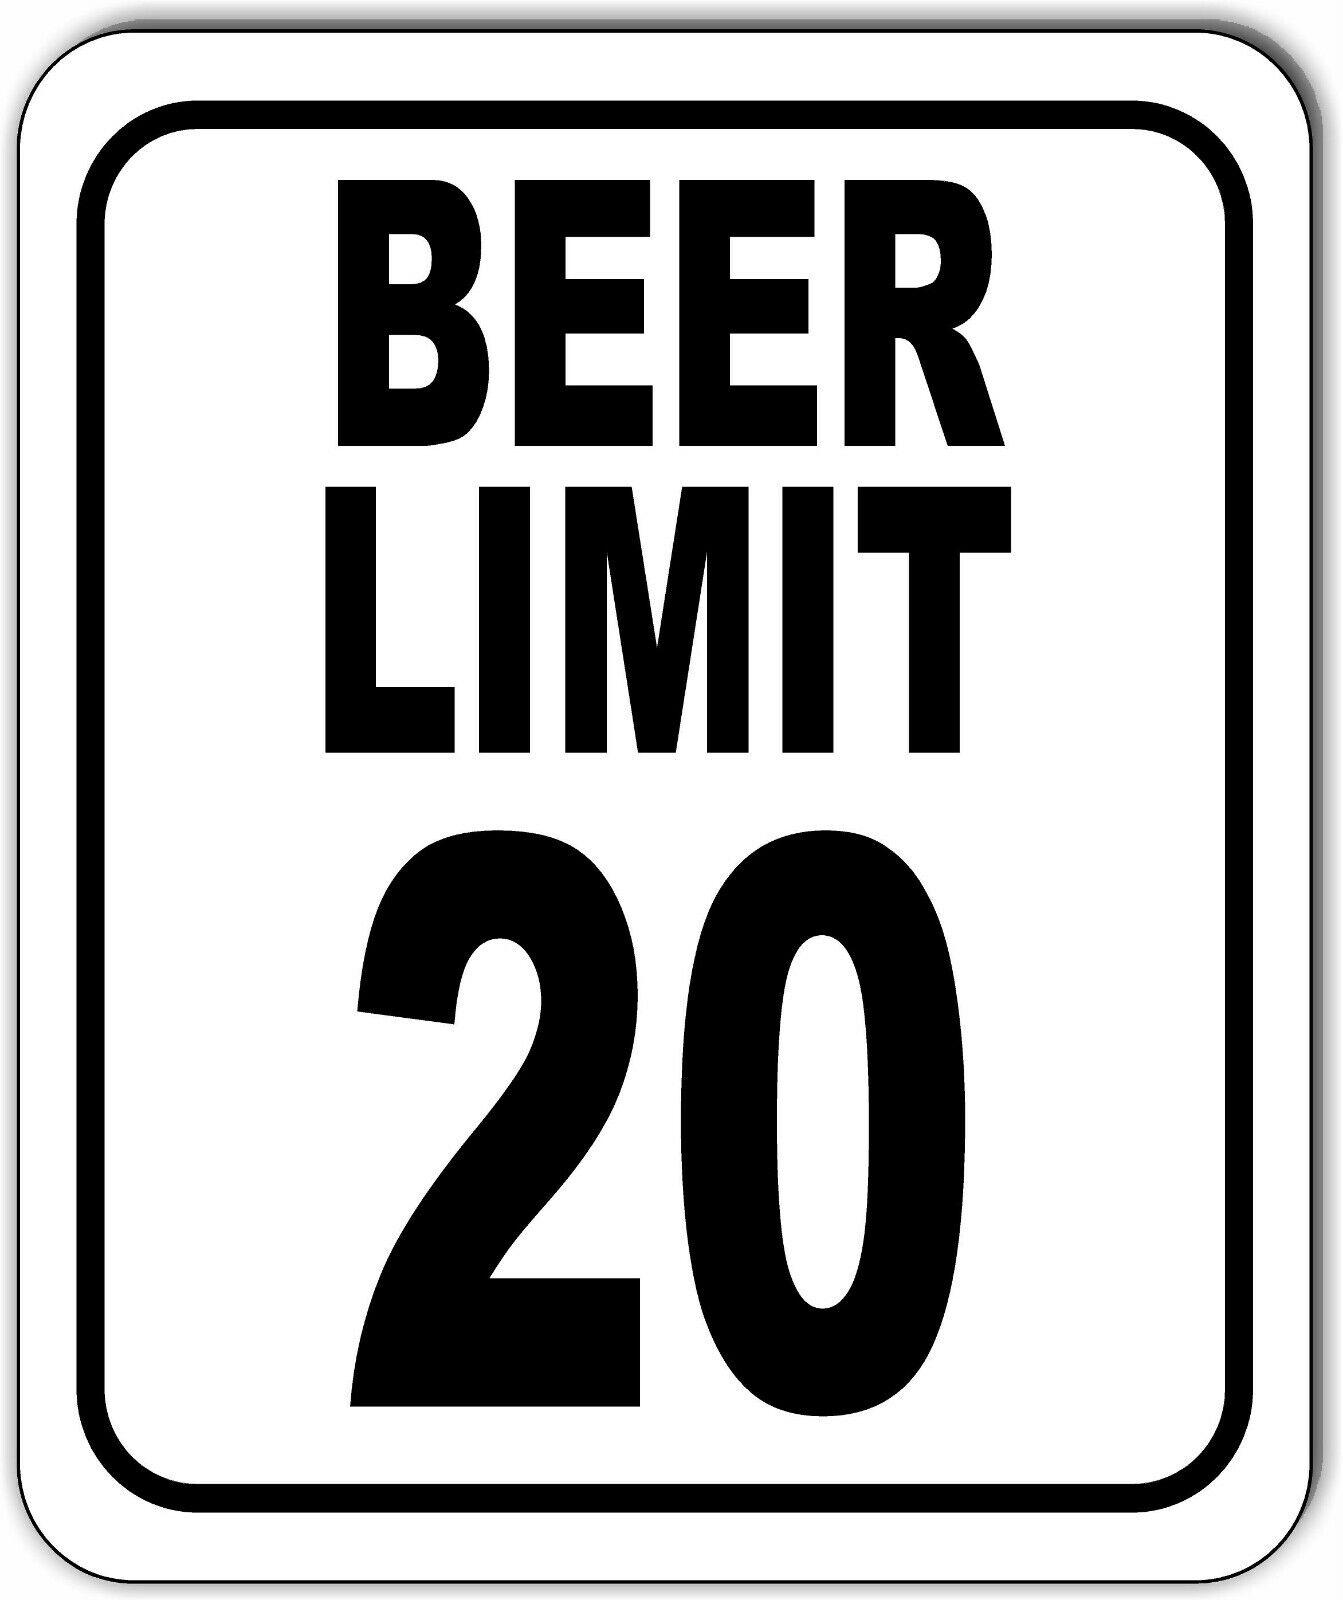 BEER LIMIT 20 FUNNY BAR MAN CAVE GARAGE Metal Aluminum Composite Sign - $9.99